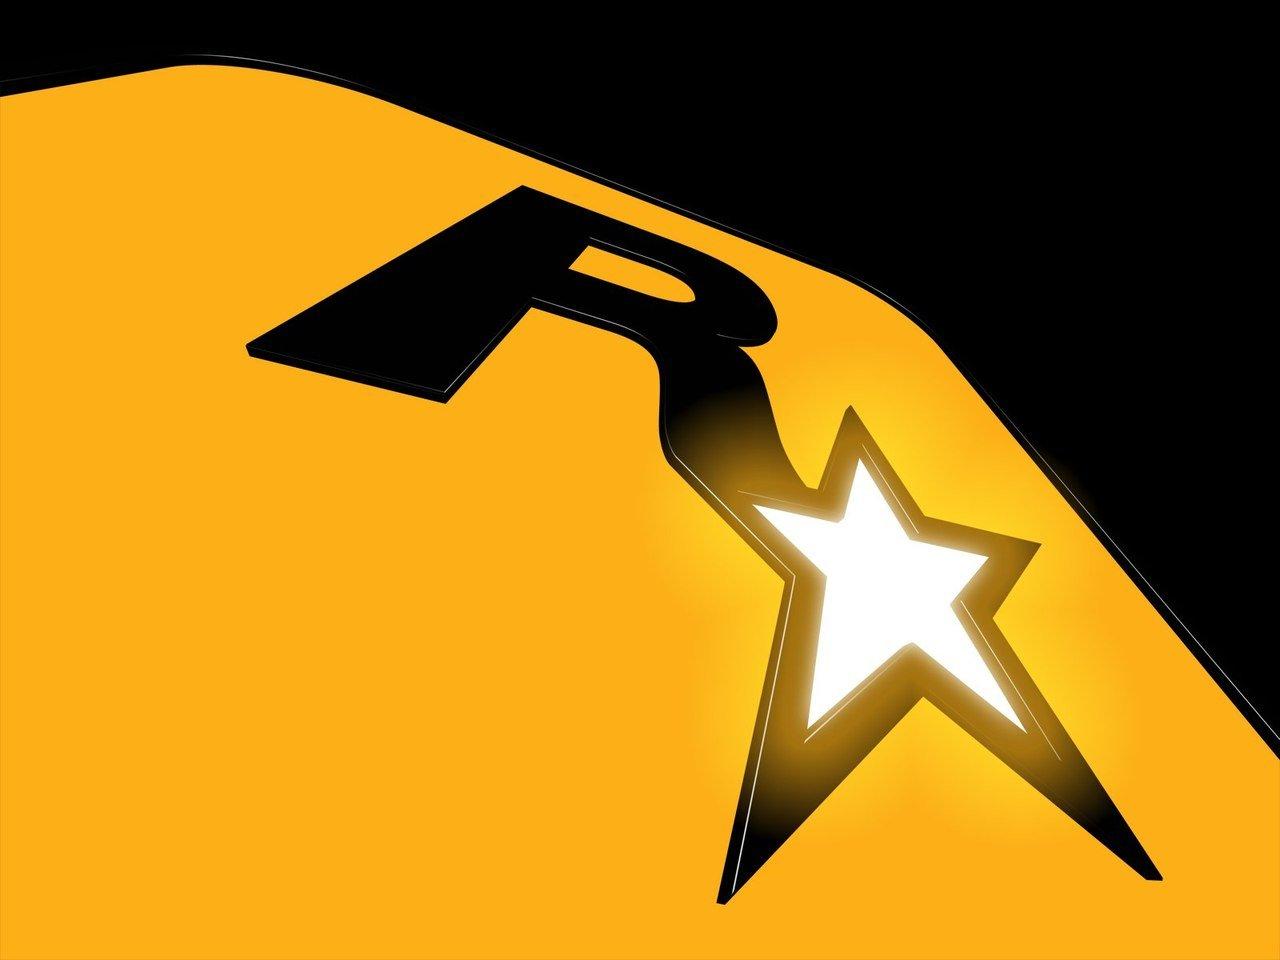 Слух: Rockstar готовит захватывающий анонс на E3 - Изображение 1